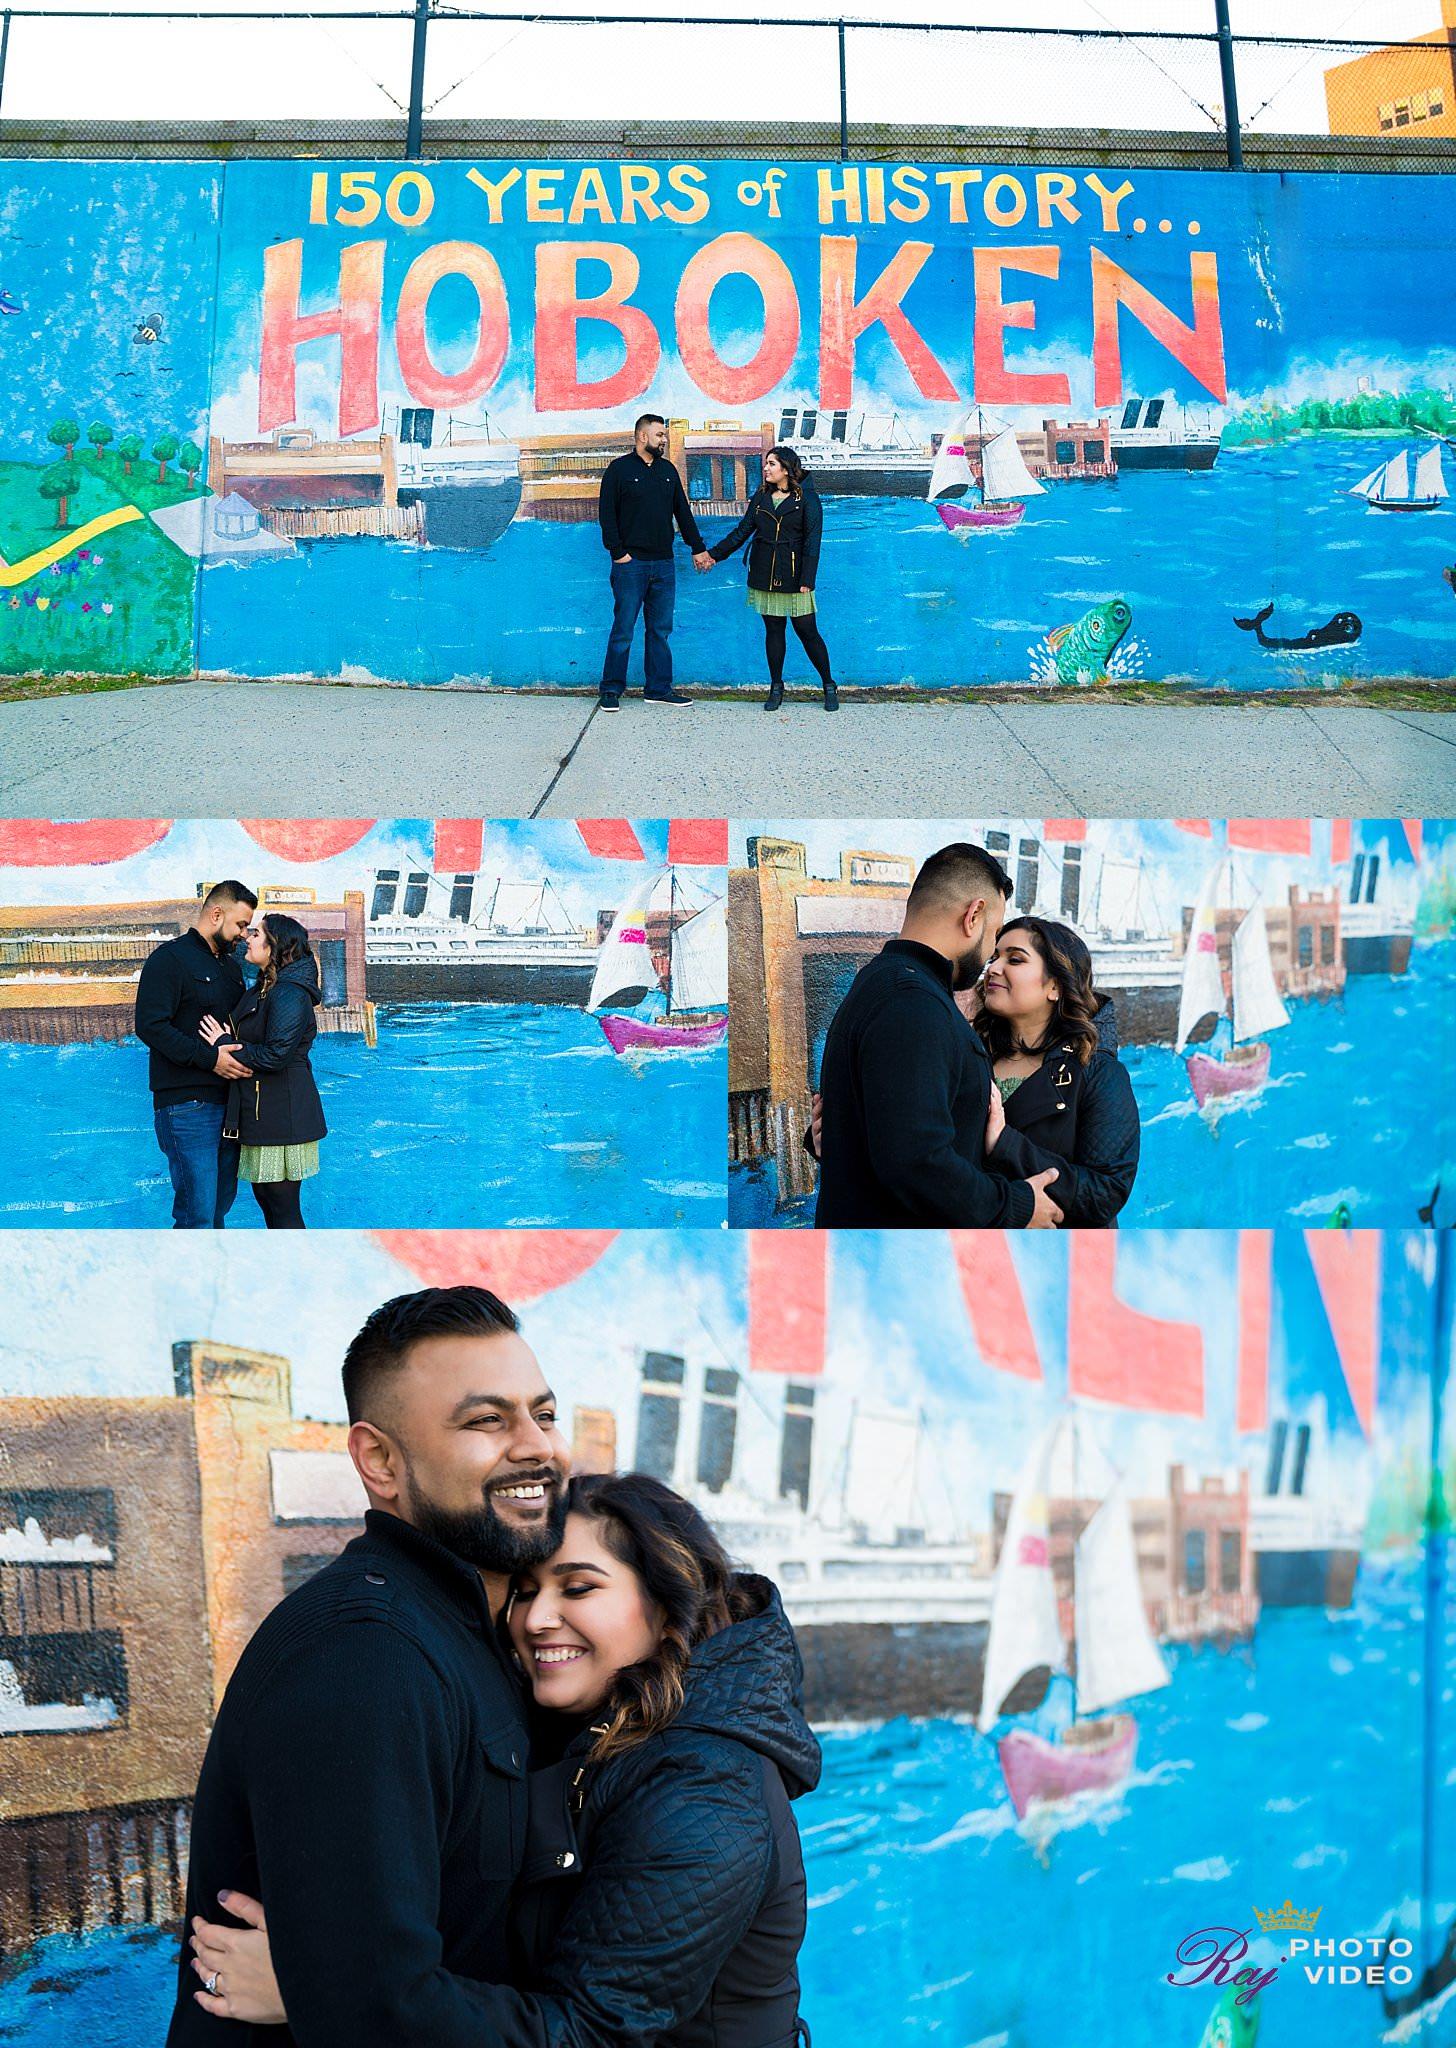 Hoboken-Pier-Engagement-Shoot-Zalak-Parag-00009_Raj_Photo_Video.jpg